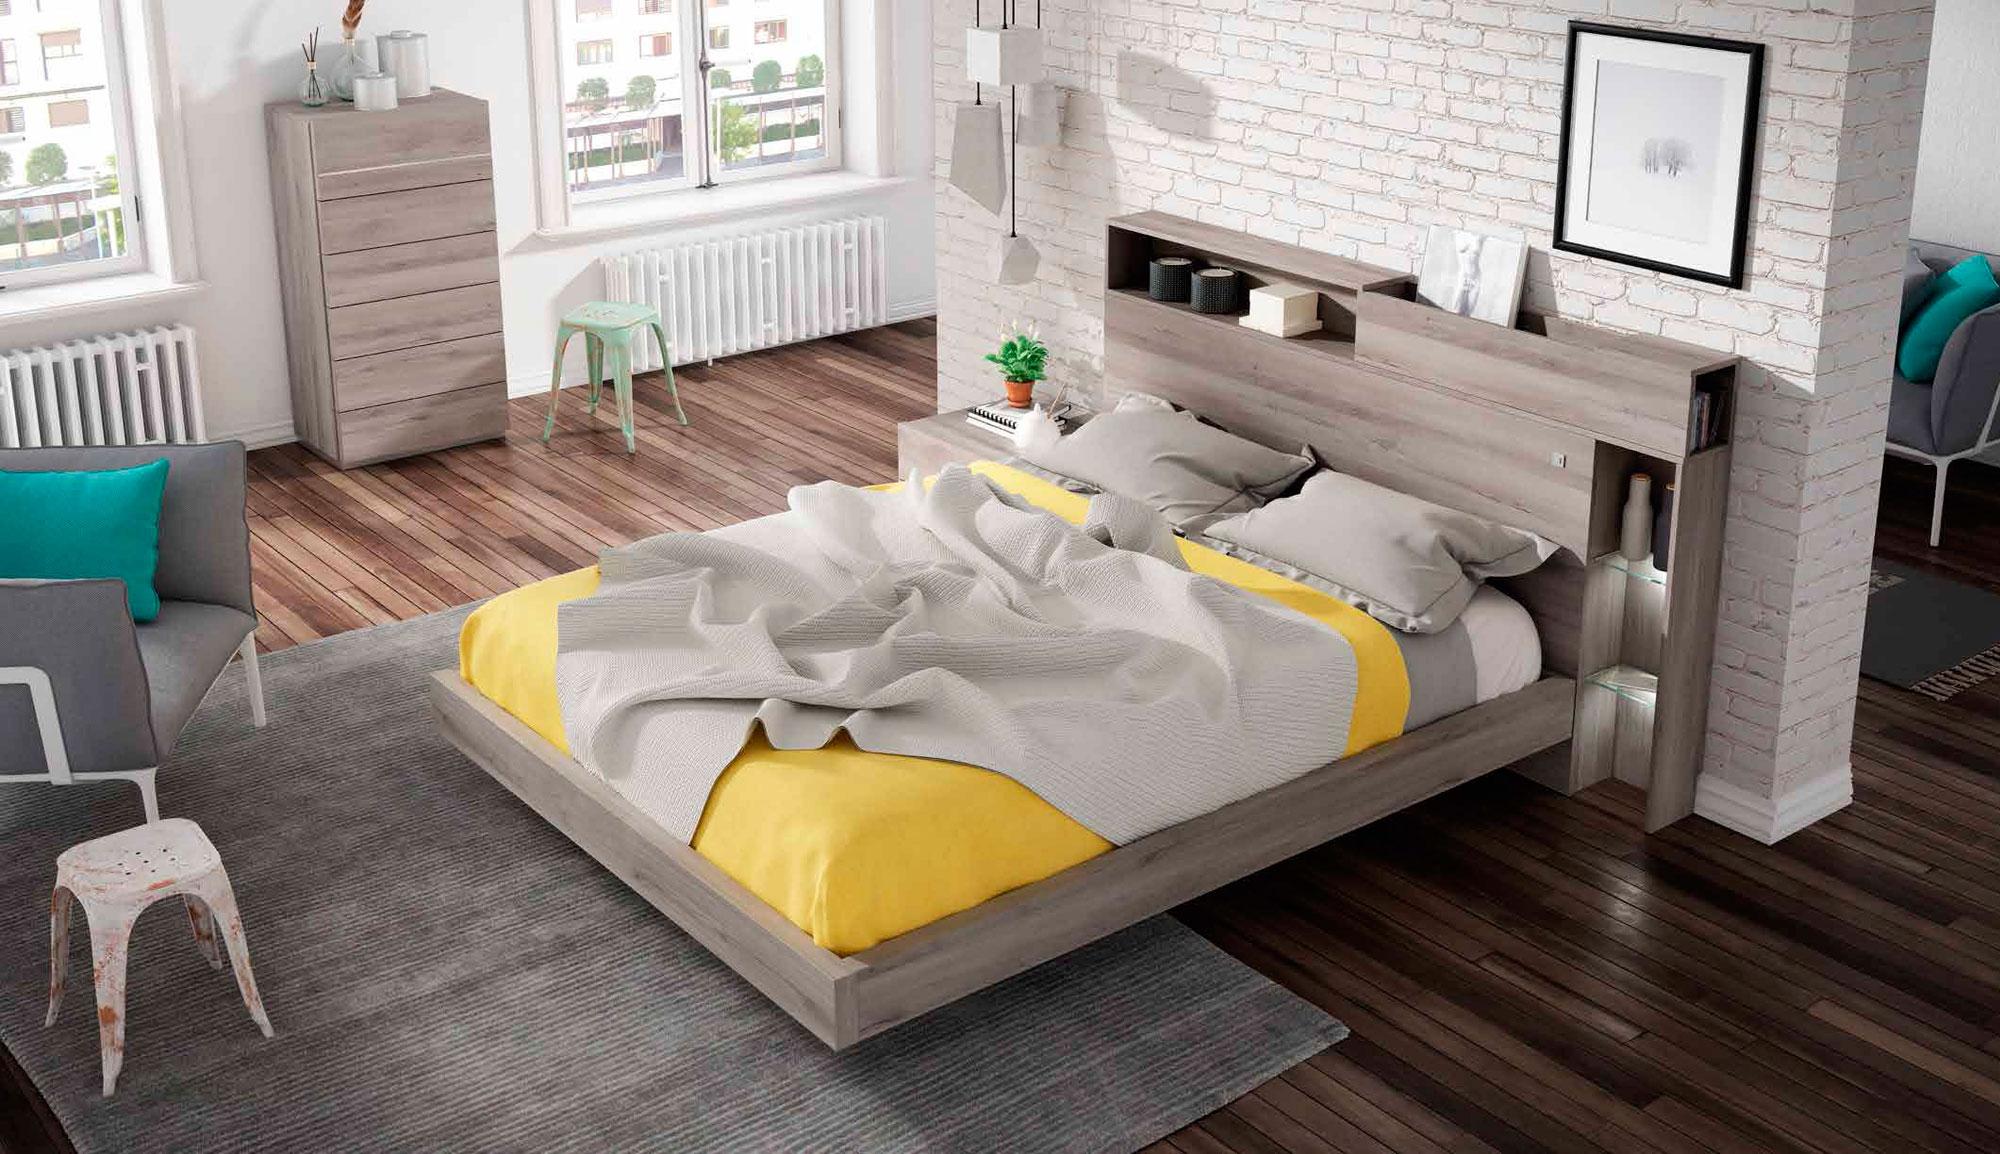 creta-dormitorio-portada